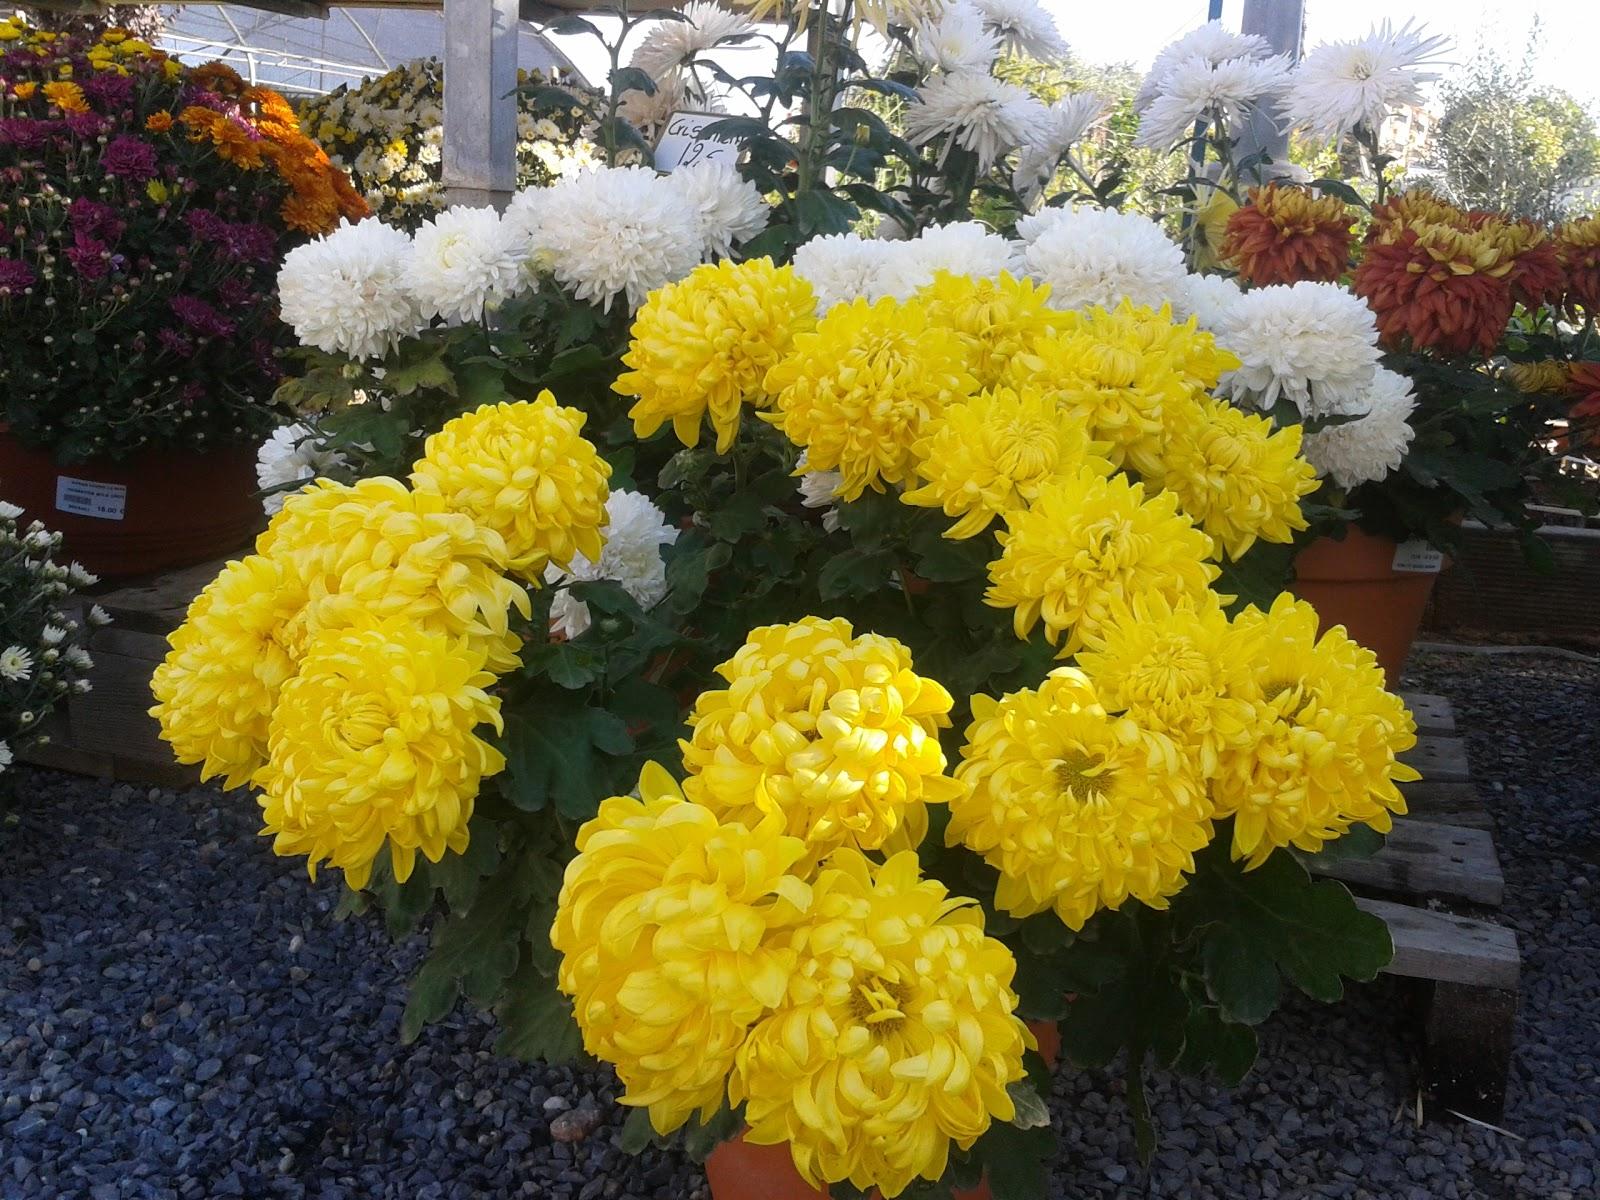 Setmana de visita al cementiri